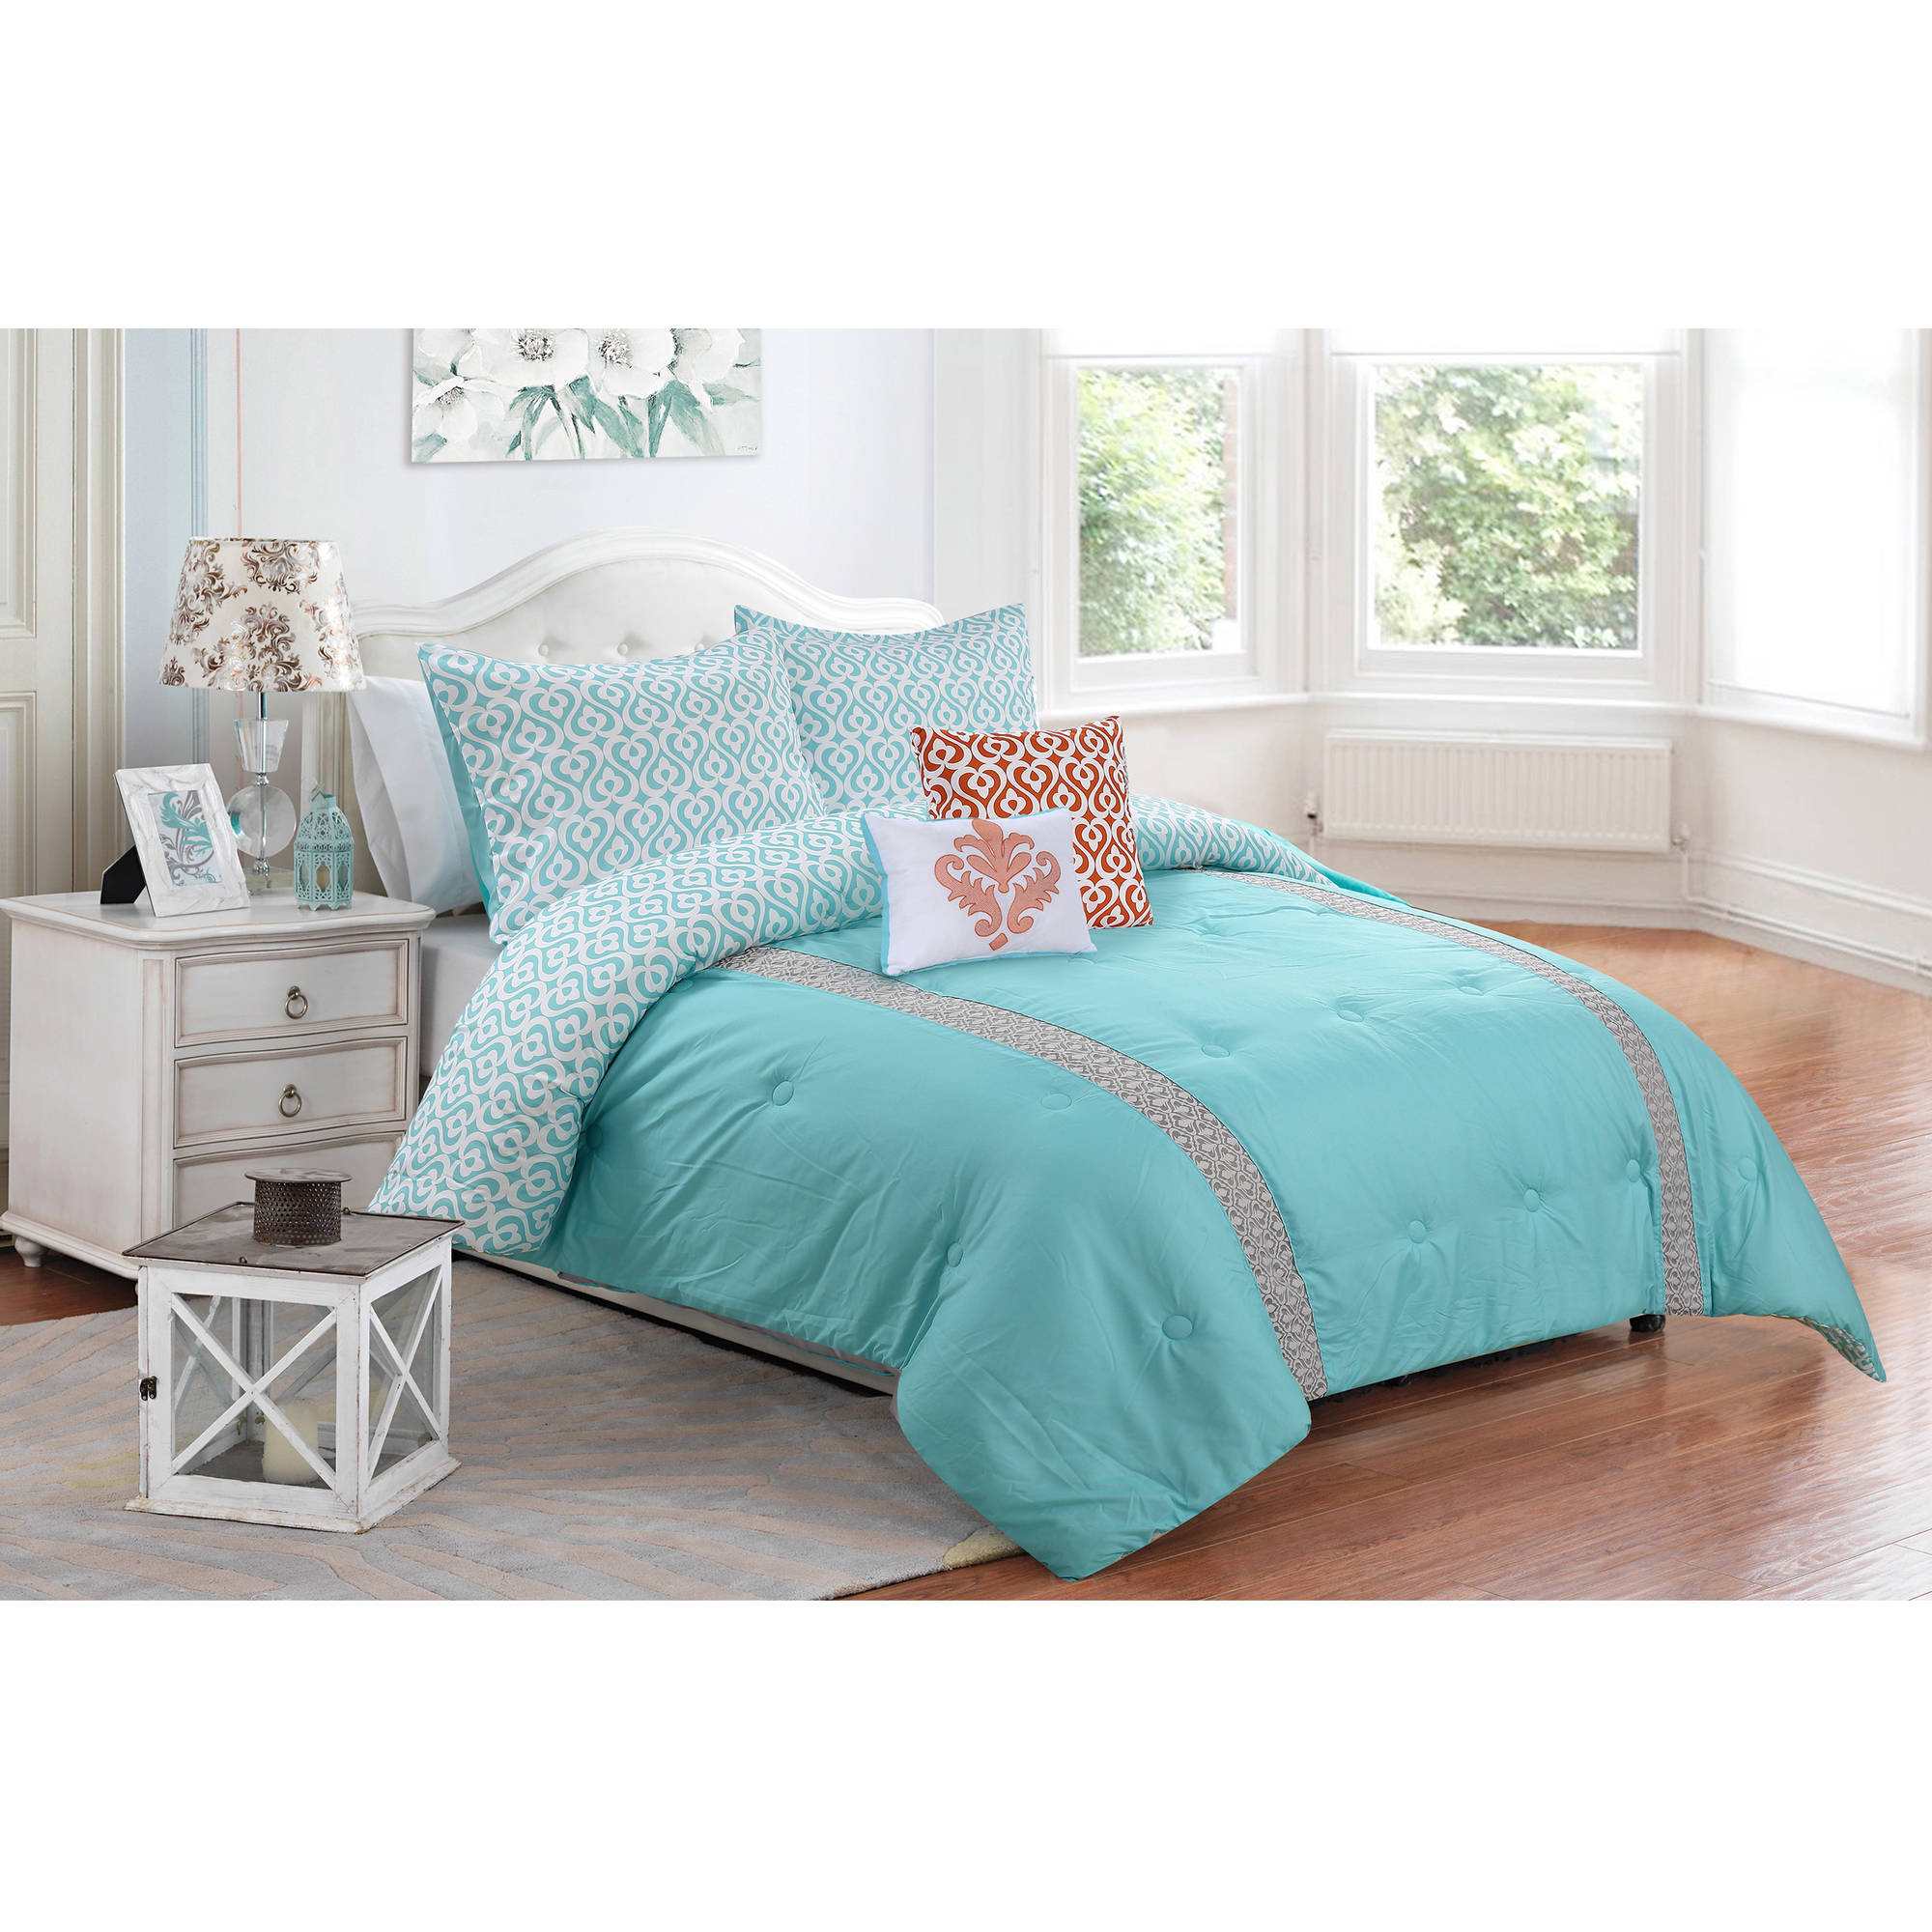 Better Homes Gardens Reversible Teal Damask 5 Piece Comforter Set With Shams Decorative Pillows King Walmart Com Walmart Com